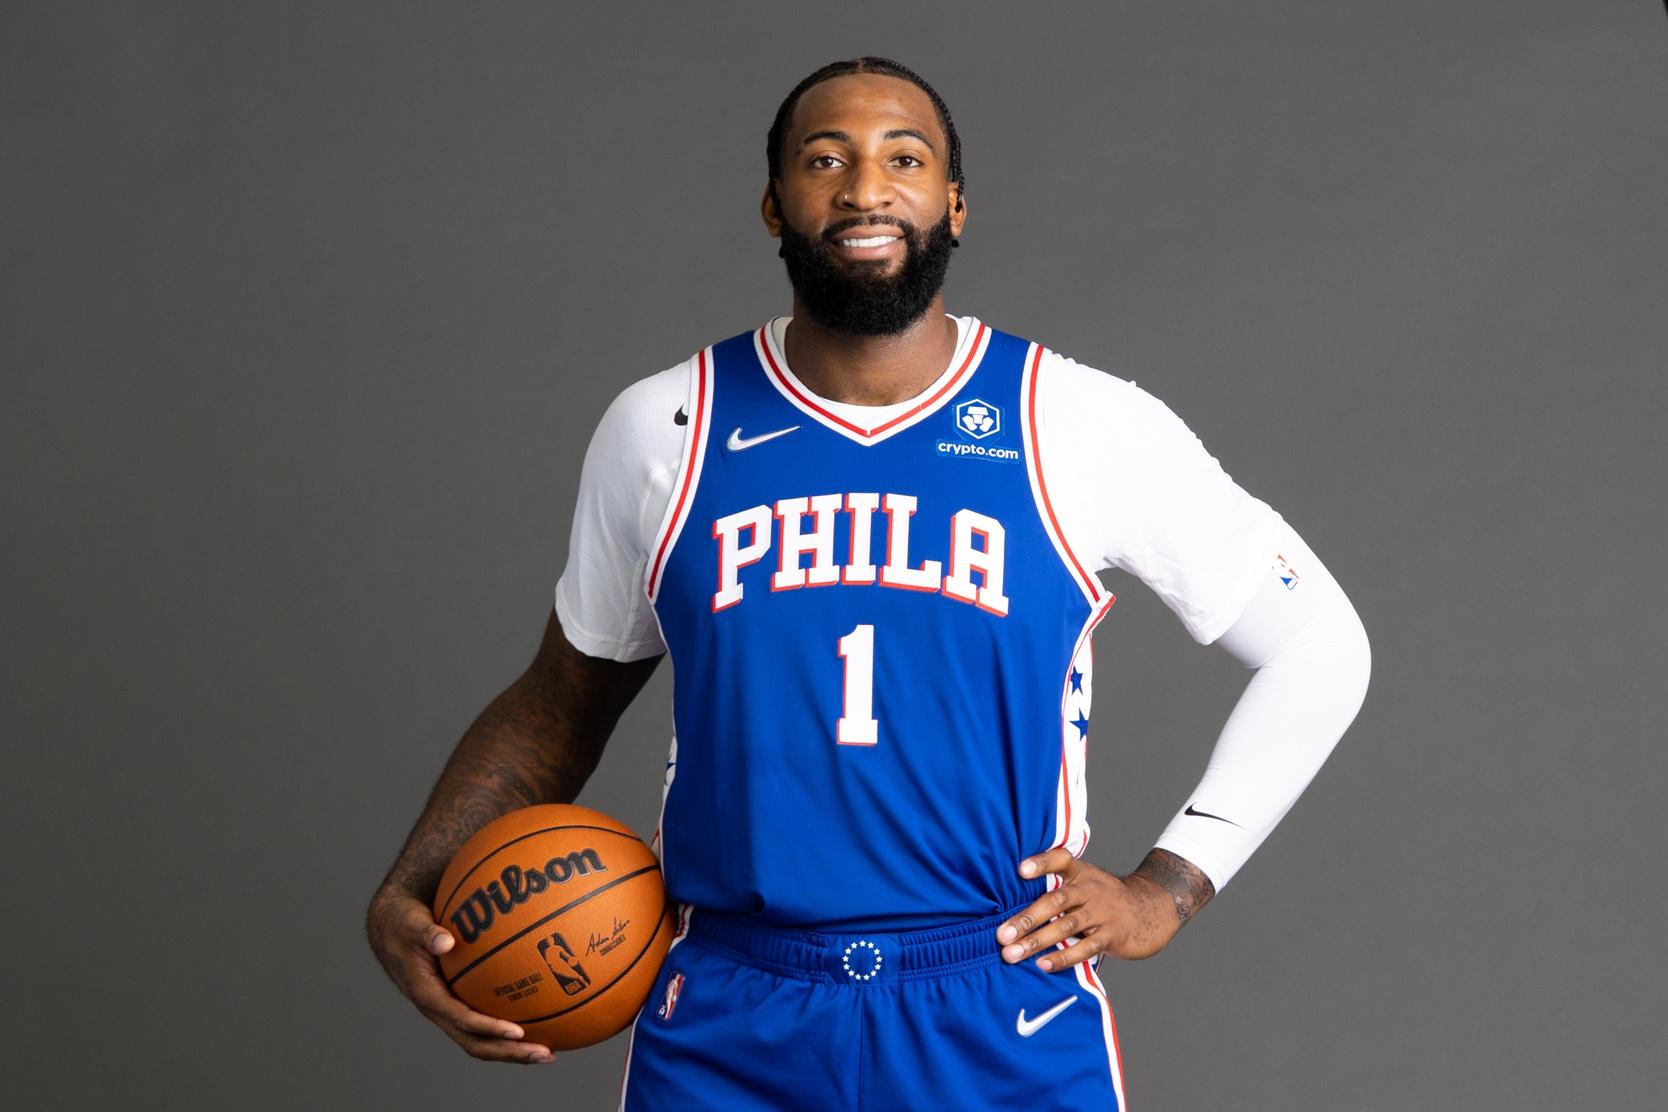 Andre Drummond, Philadelphia 76ers